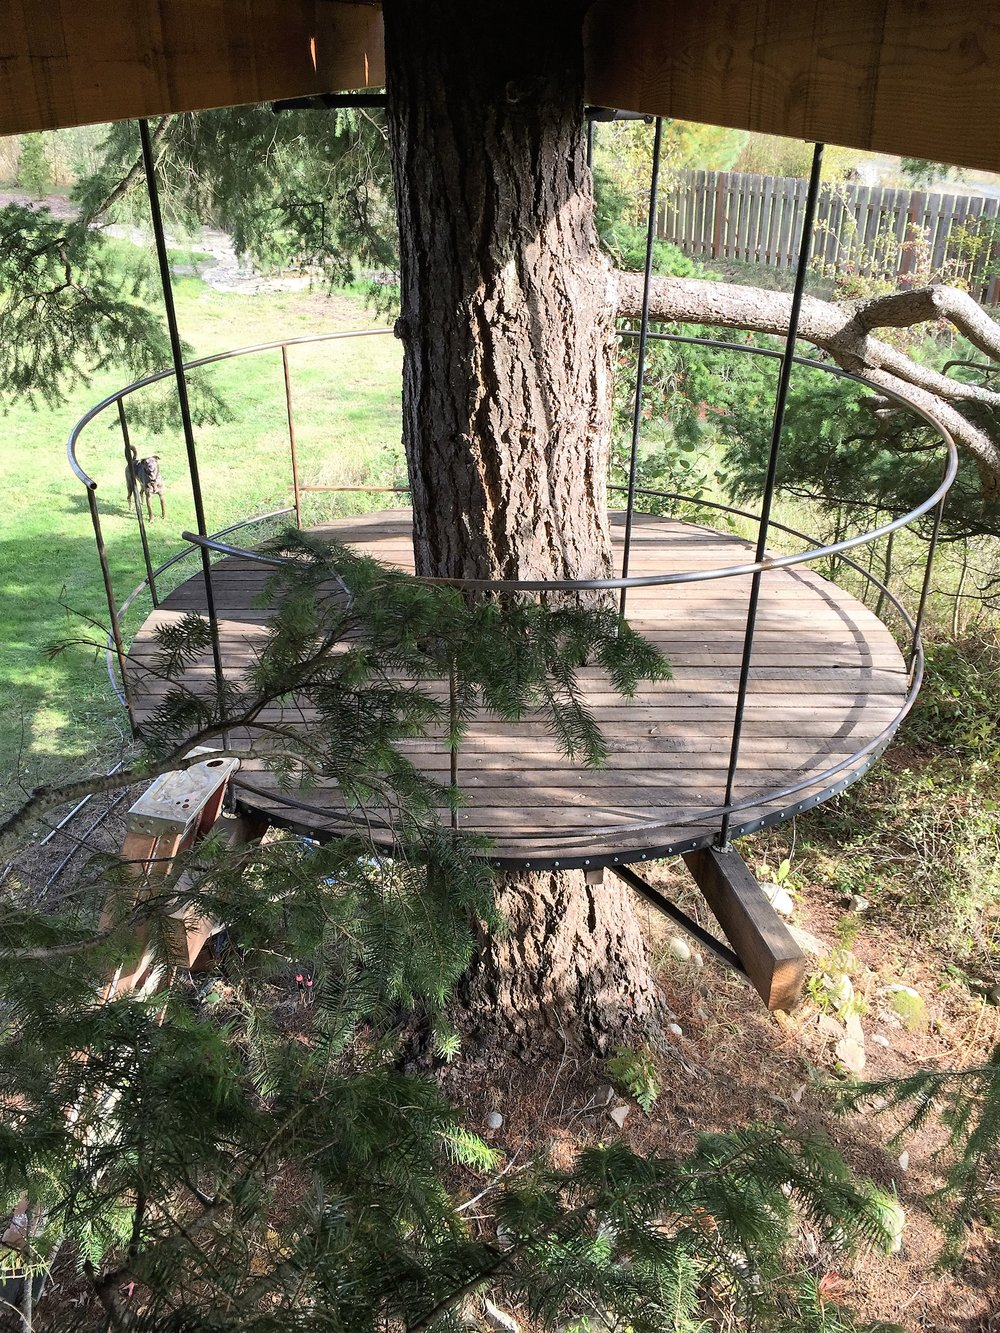 tree fort lower circular deck railing and platform around tree trunk.JPG